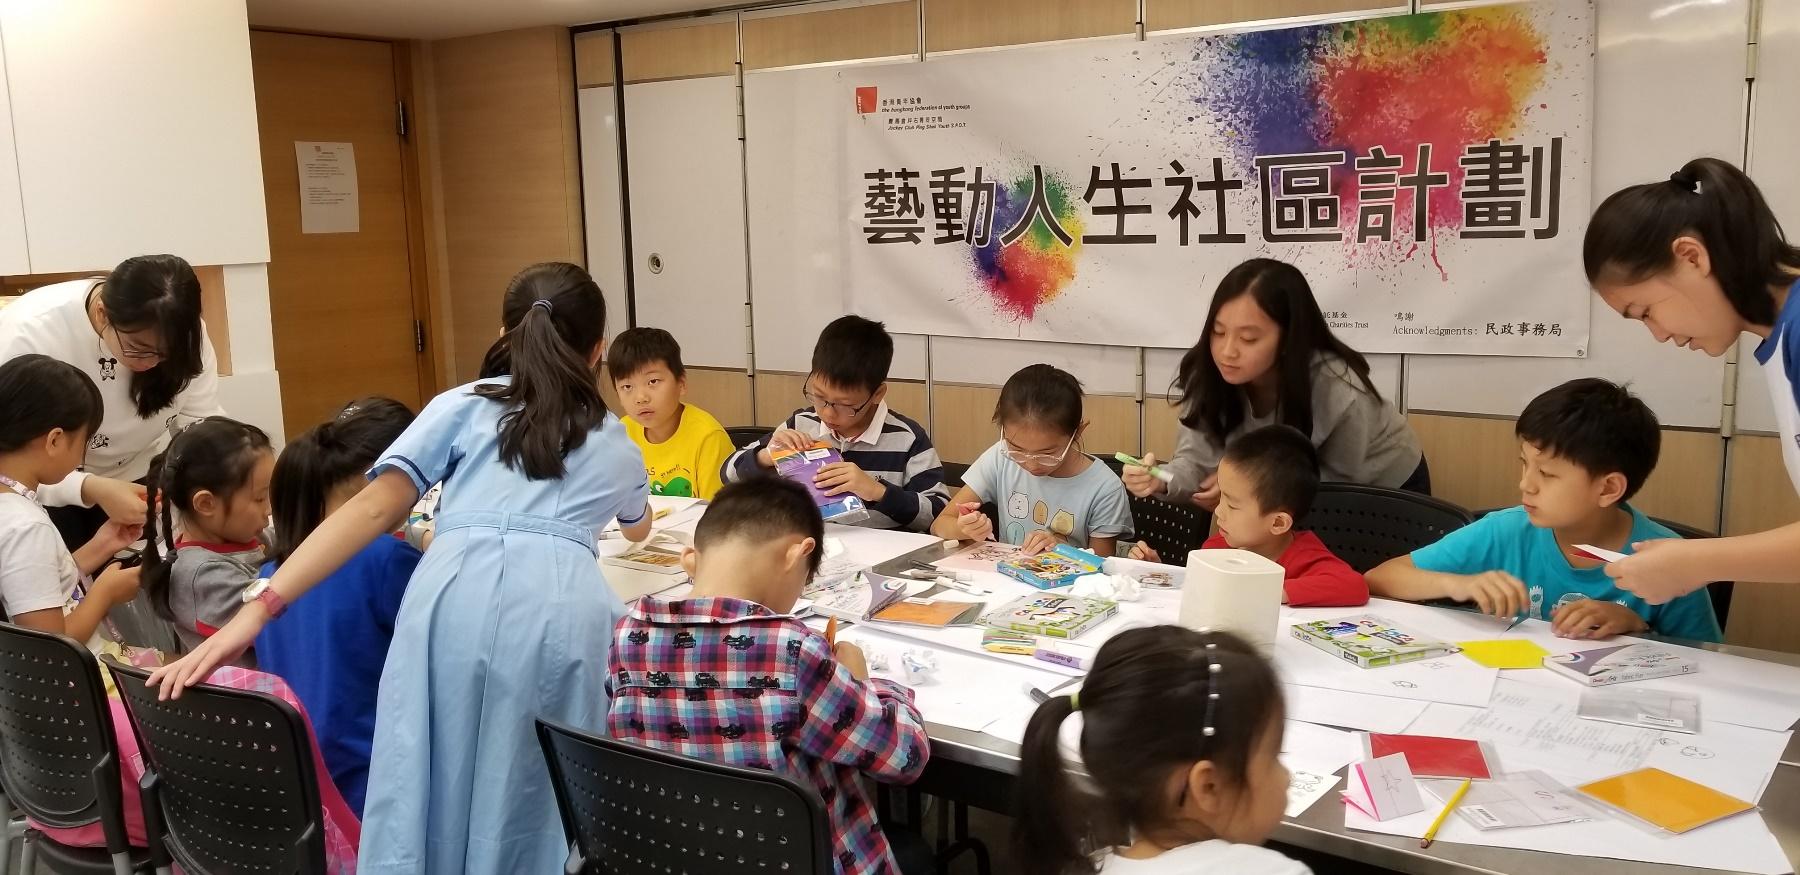 http://npc.edu.hk/sites/default/files/20181110_120704.jpg